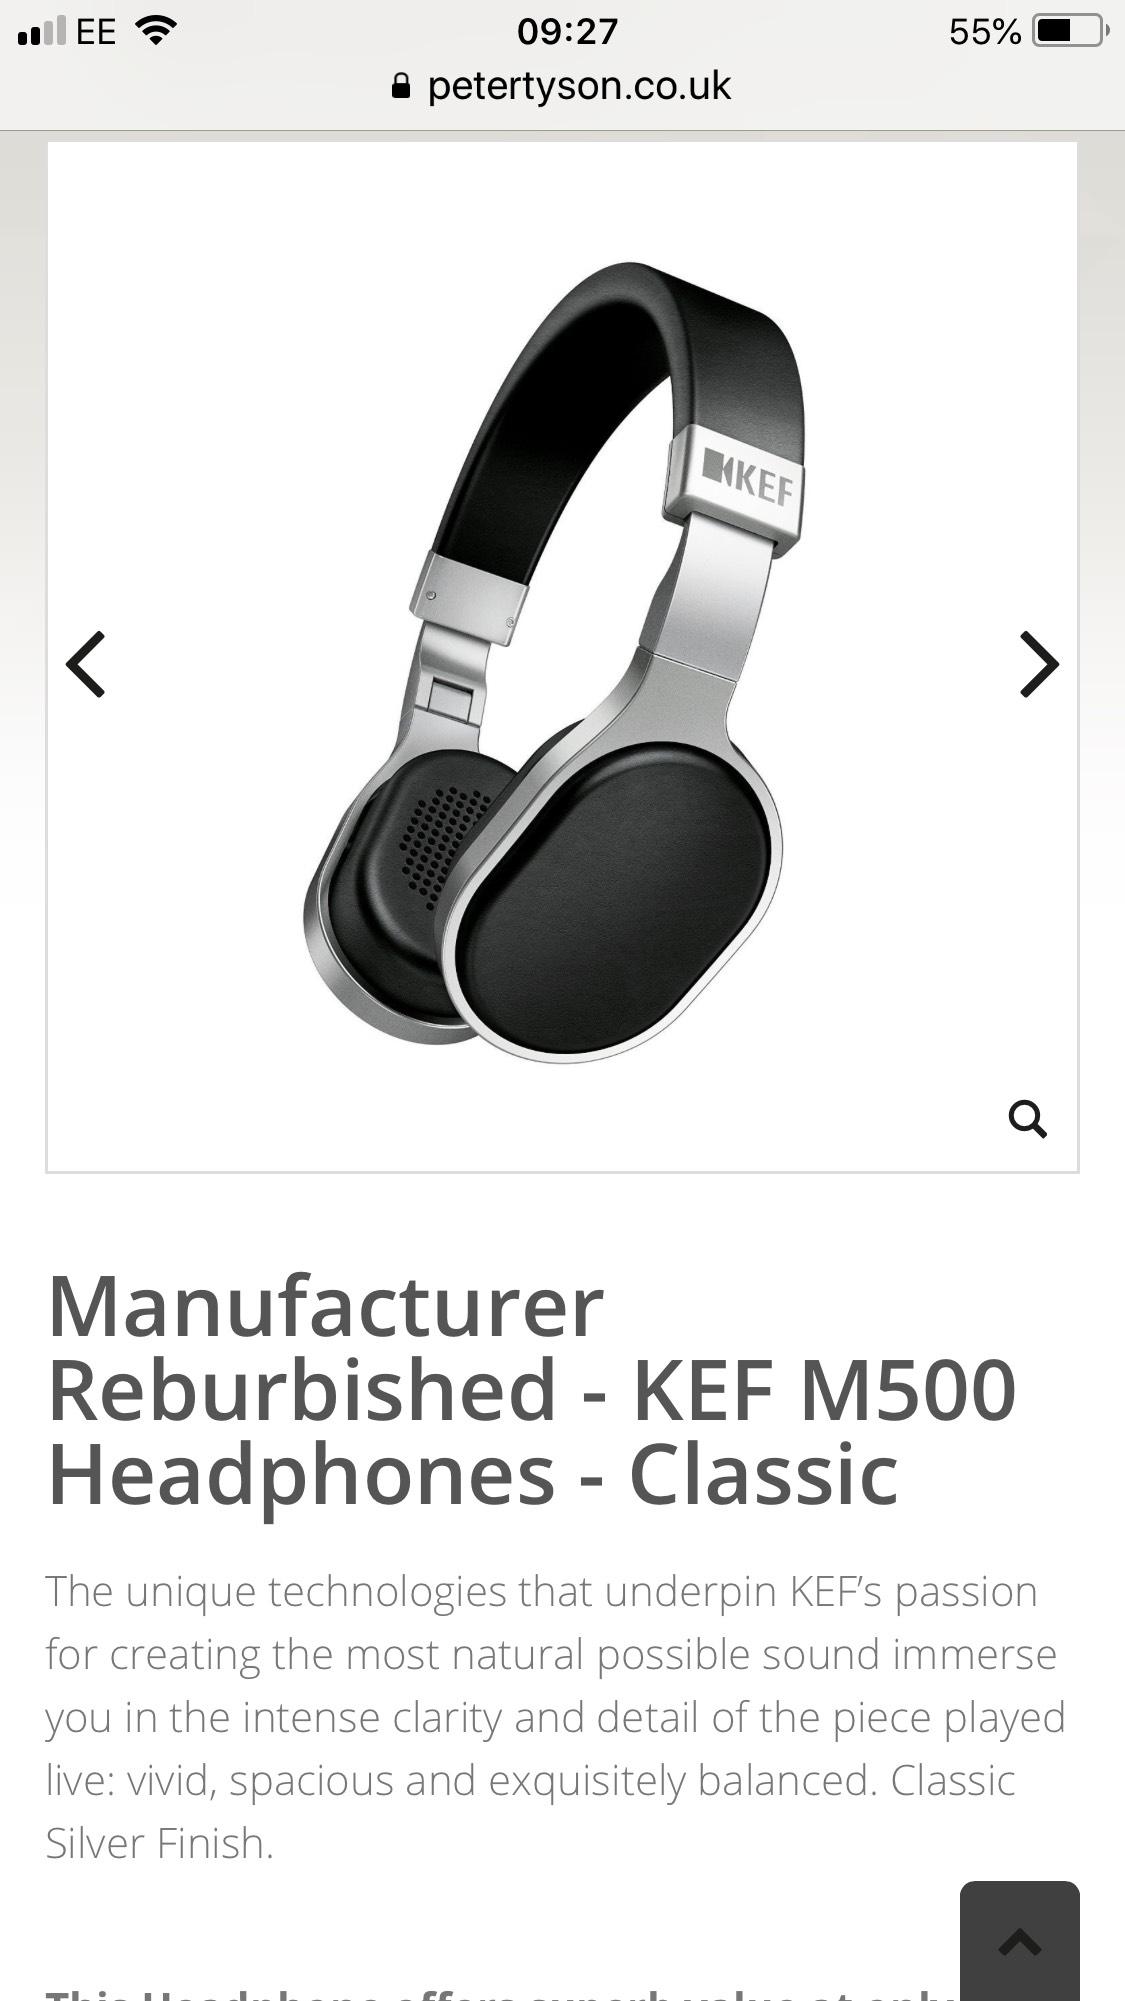 Manufacturer Reburbished - KEF M500 Headphones - Classic - £79 @ Peter Tyson